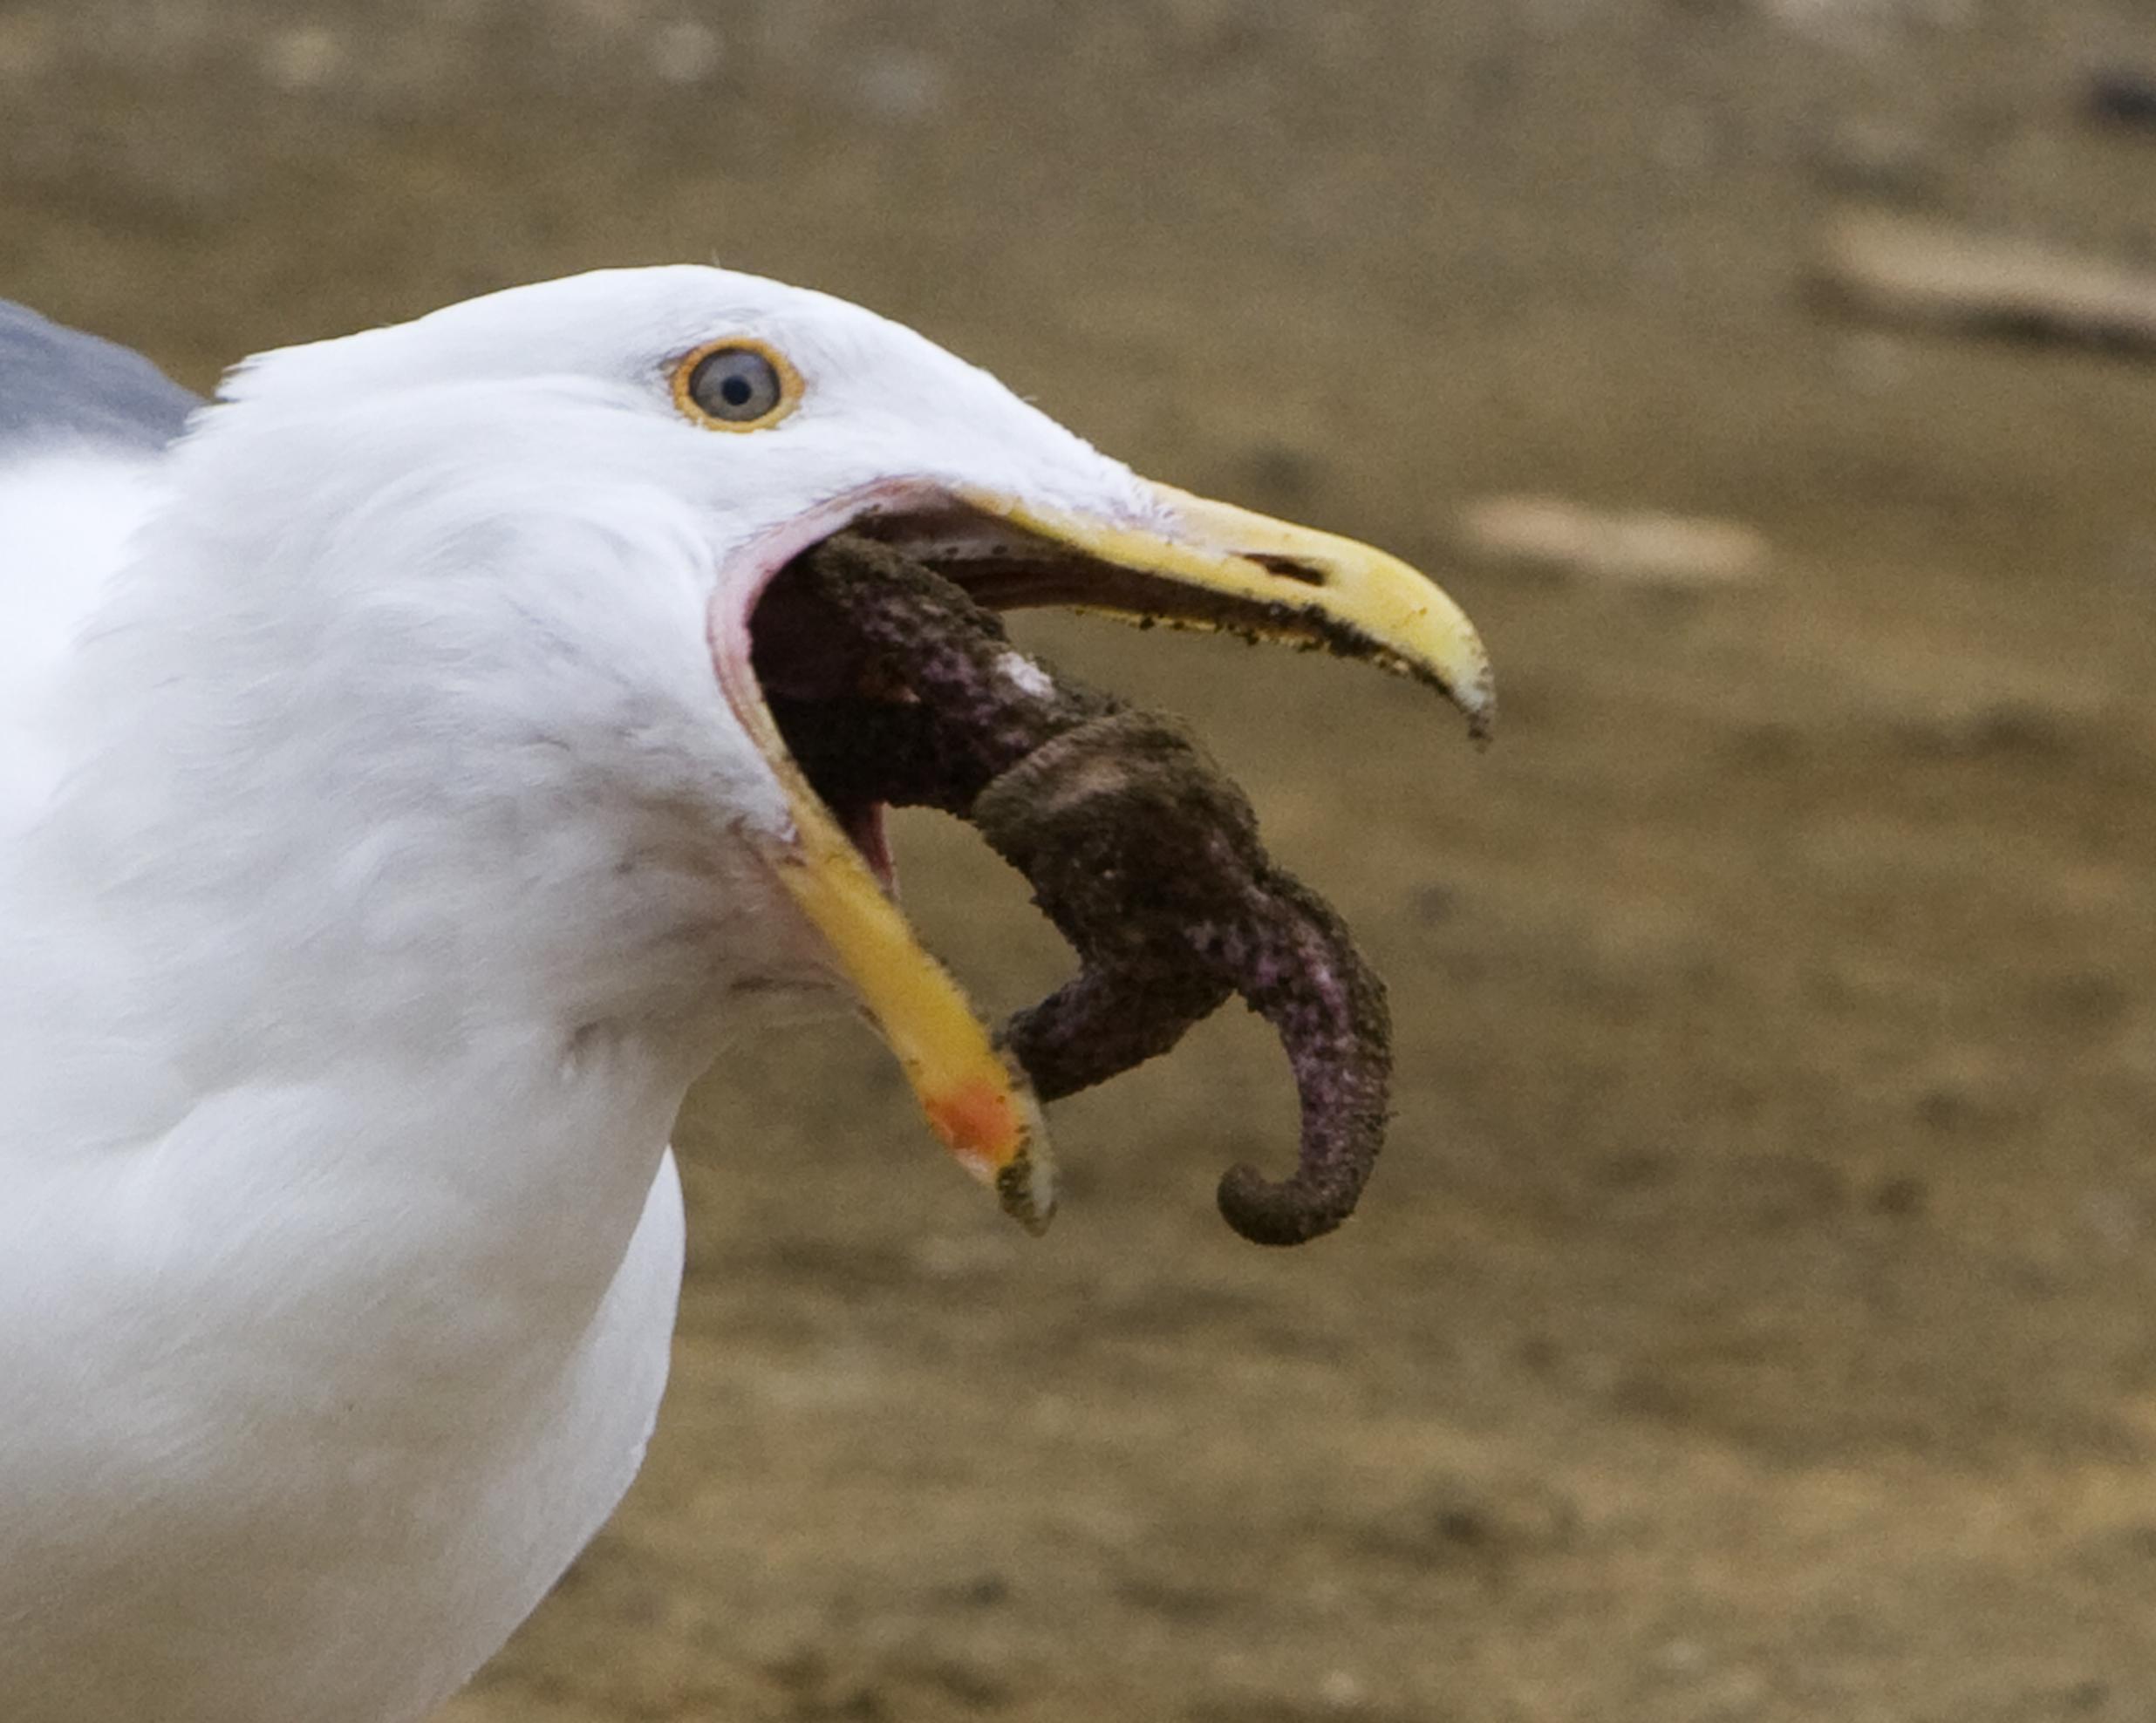 Bird Eating Bird Food